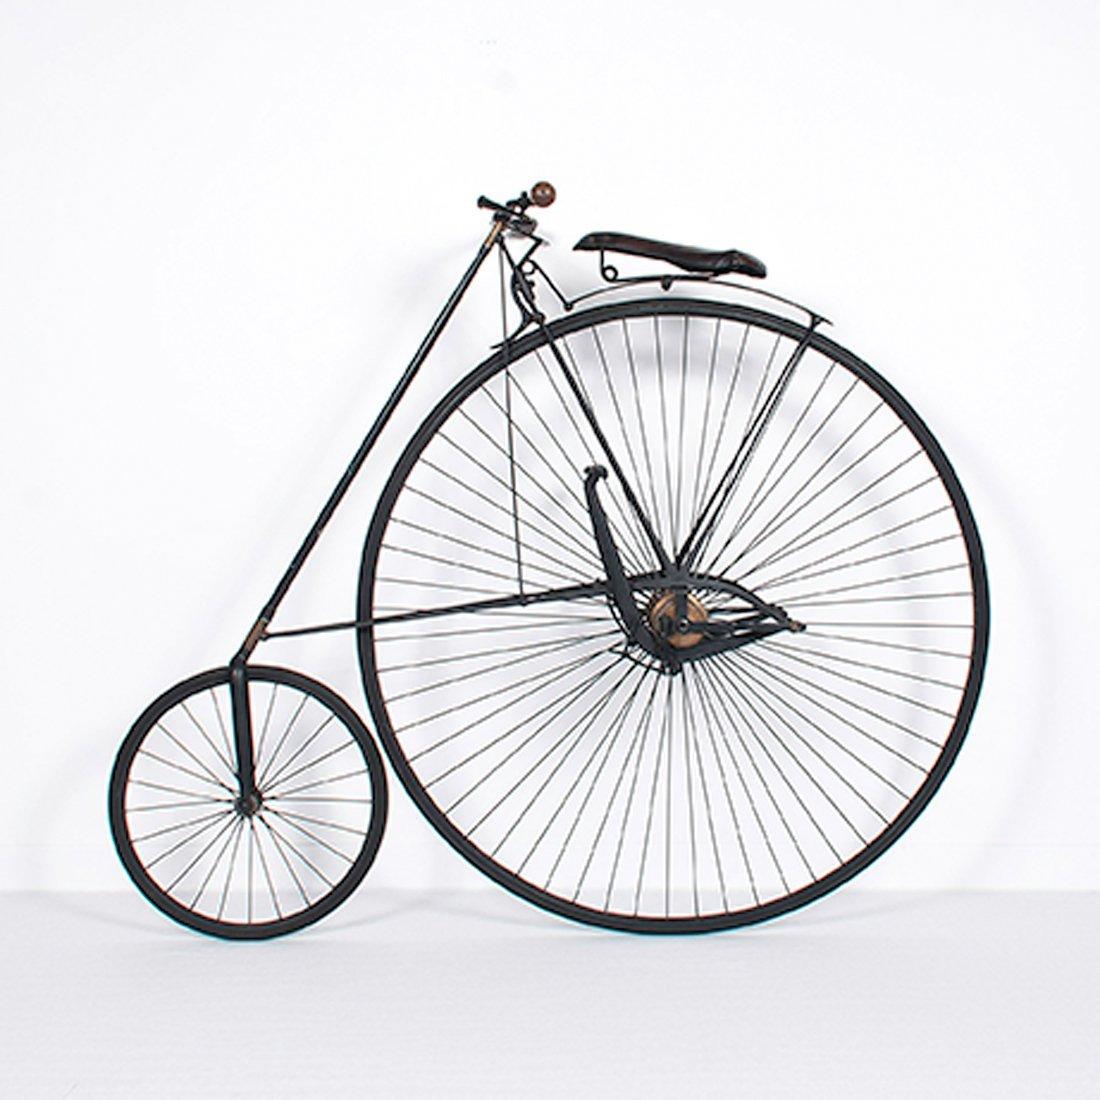 American Star High Wheel Bicycle by H.B. Smith Machine